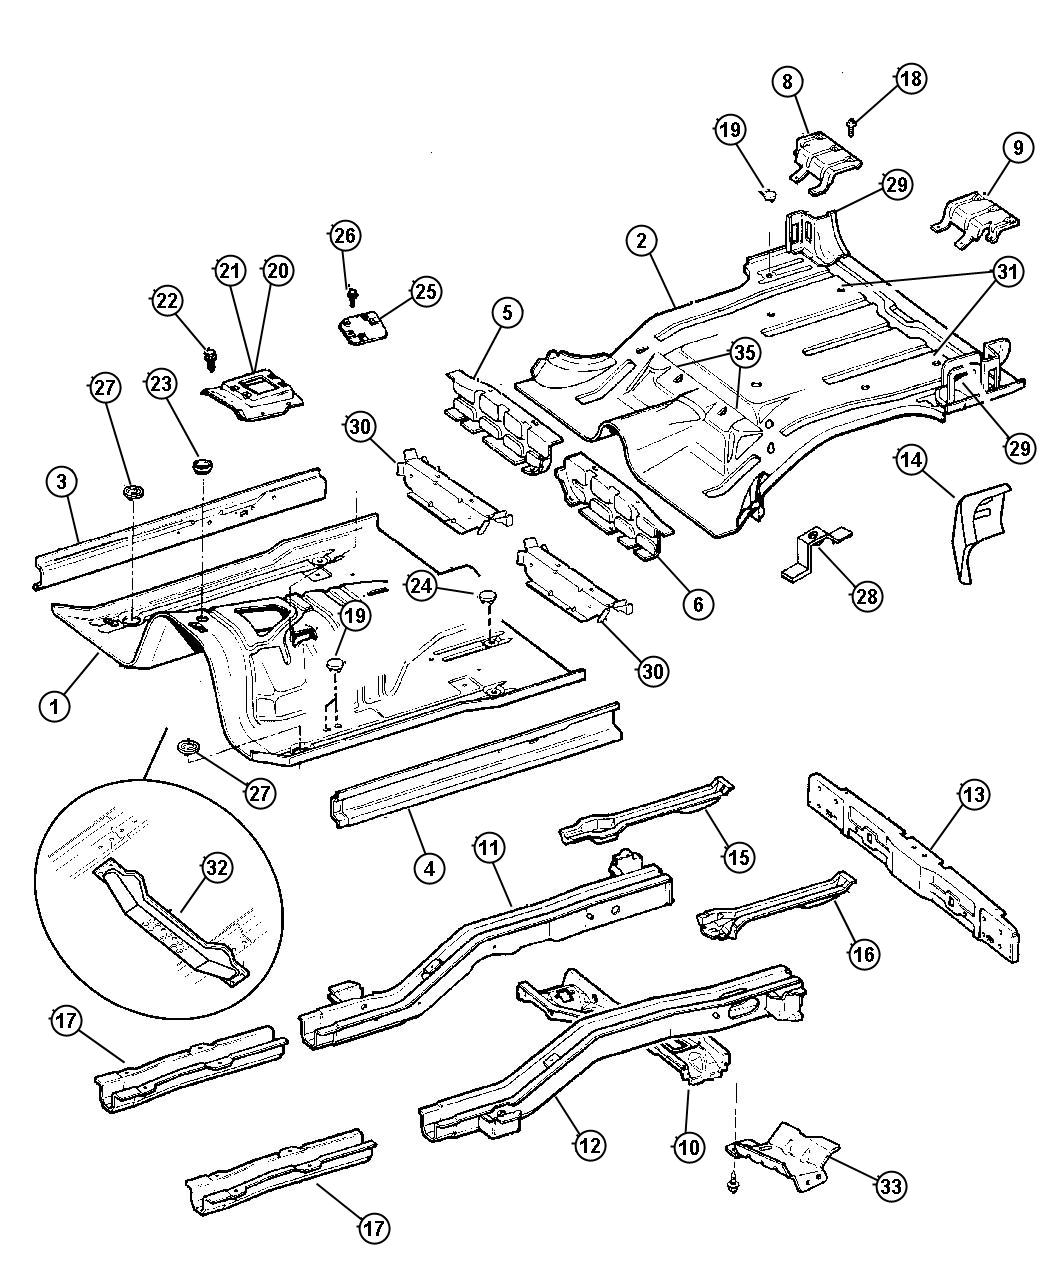 1999 isuzu trooper parts catalog